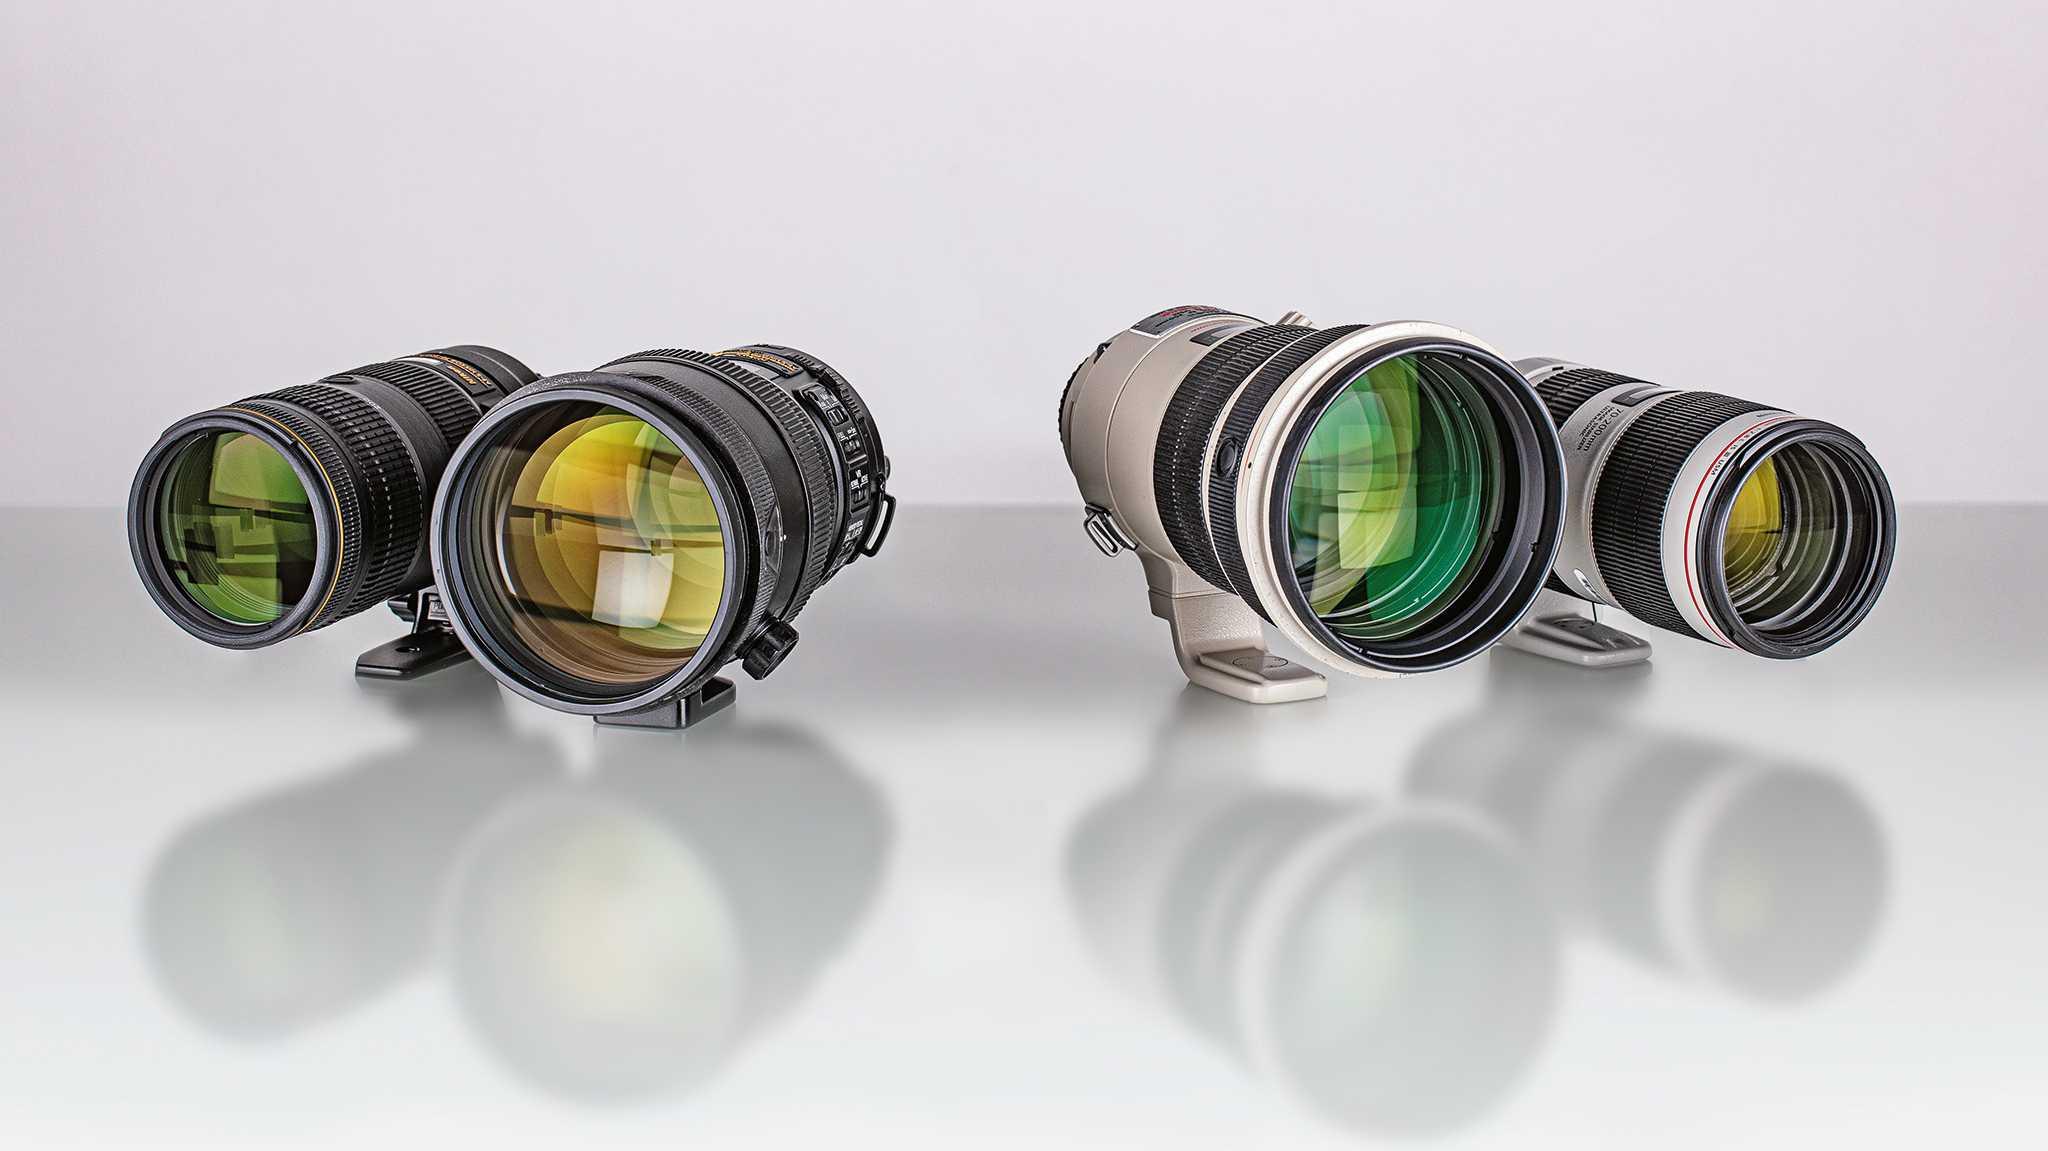 Zoom versus Festbrennweite: 200-Millimeter-Objektive im Test